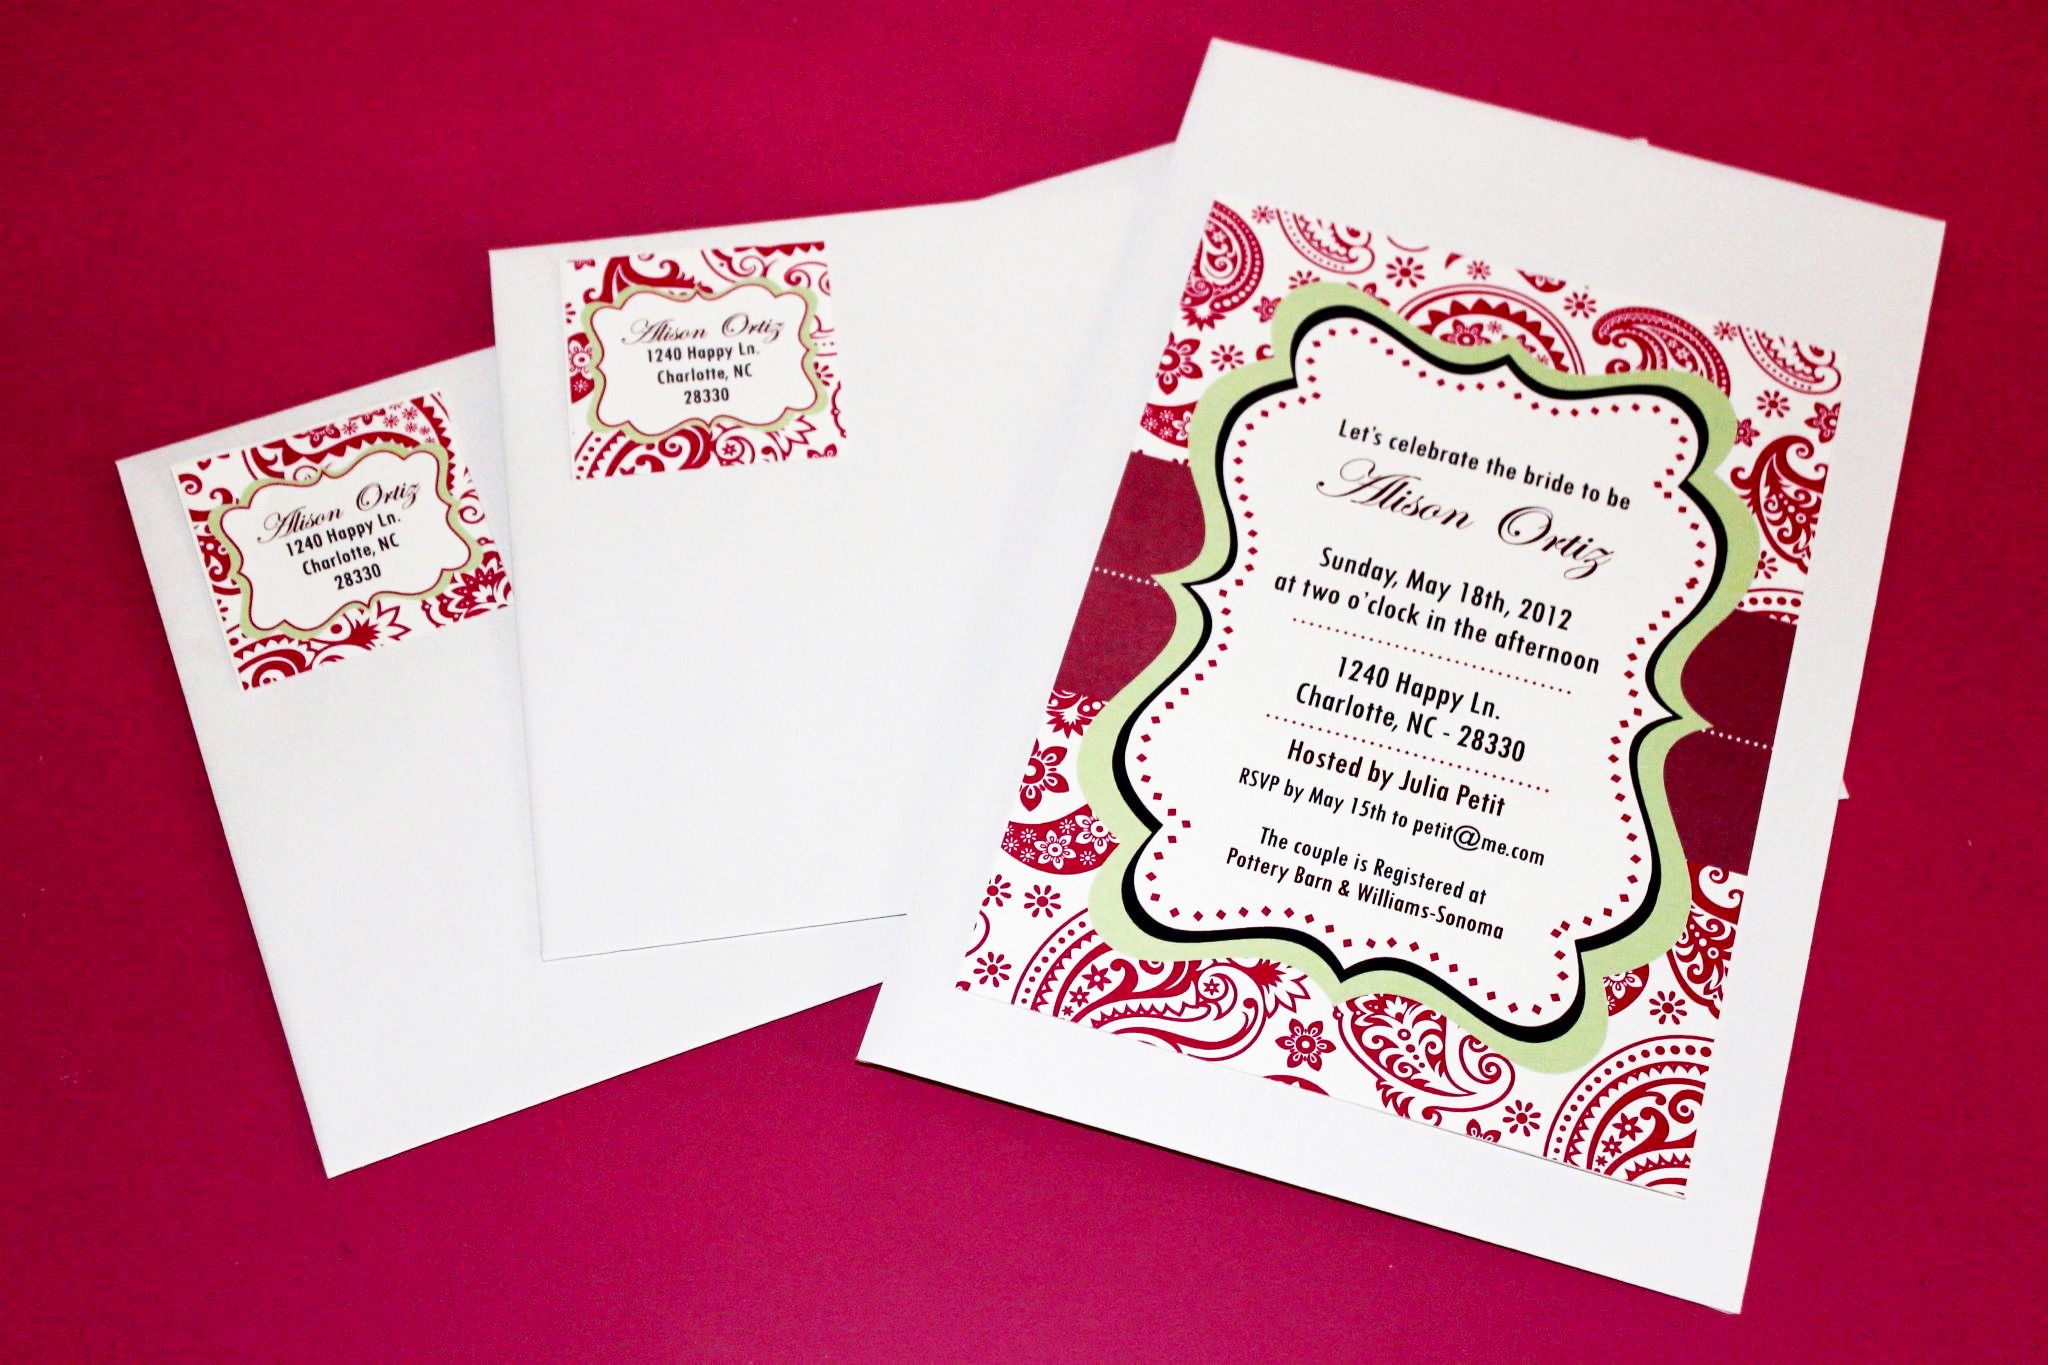 Free Printable Bridal Shower Invitations Beautiful Free Bridal Shower Printables From Wanessa Carolina